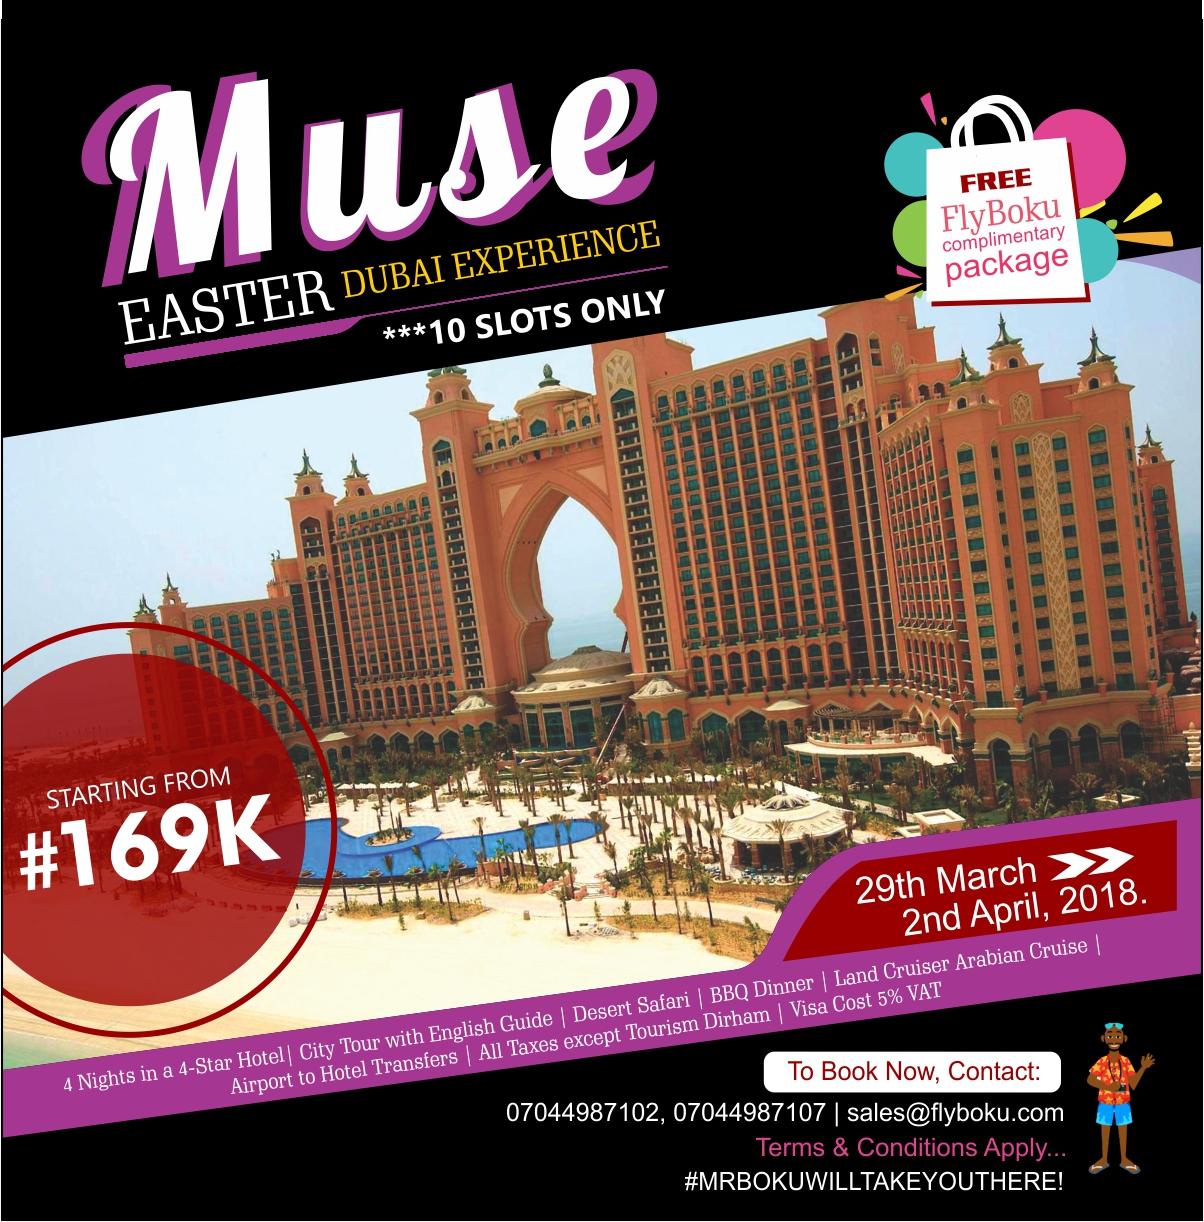 Muse- Easter Dubai Experience_1(1)